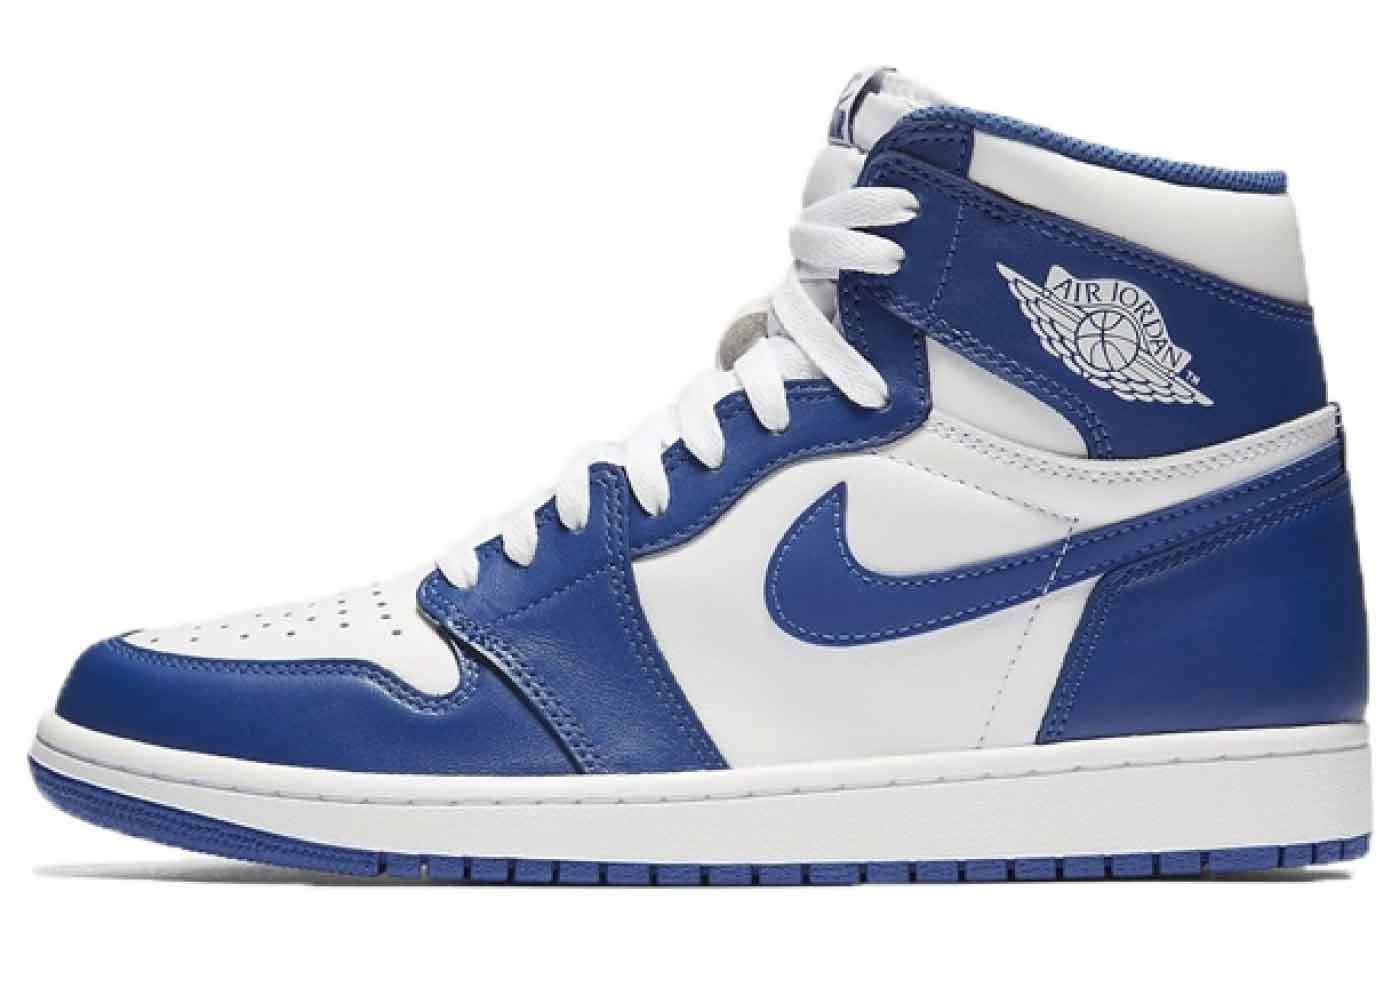 Nike Air Jordan 1 Retro Storm Blueの写真